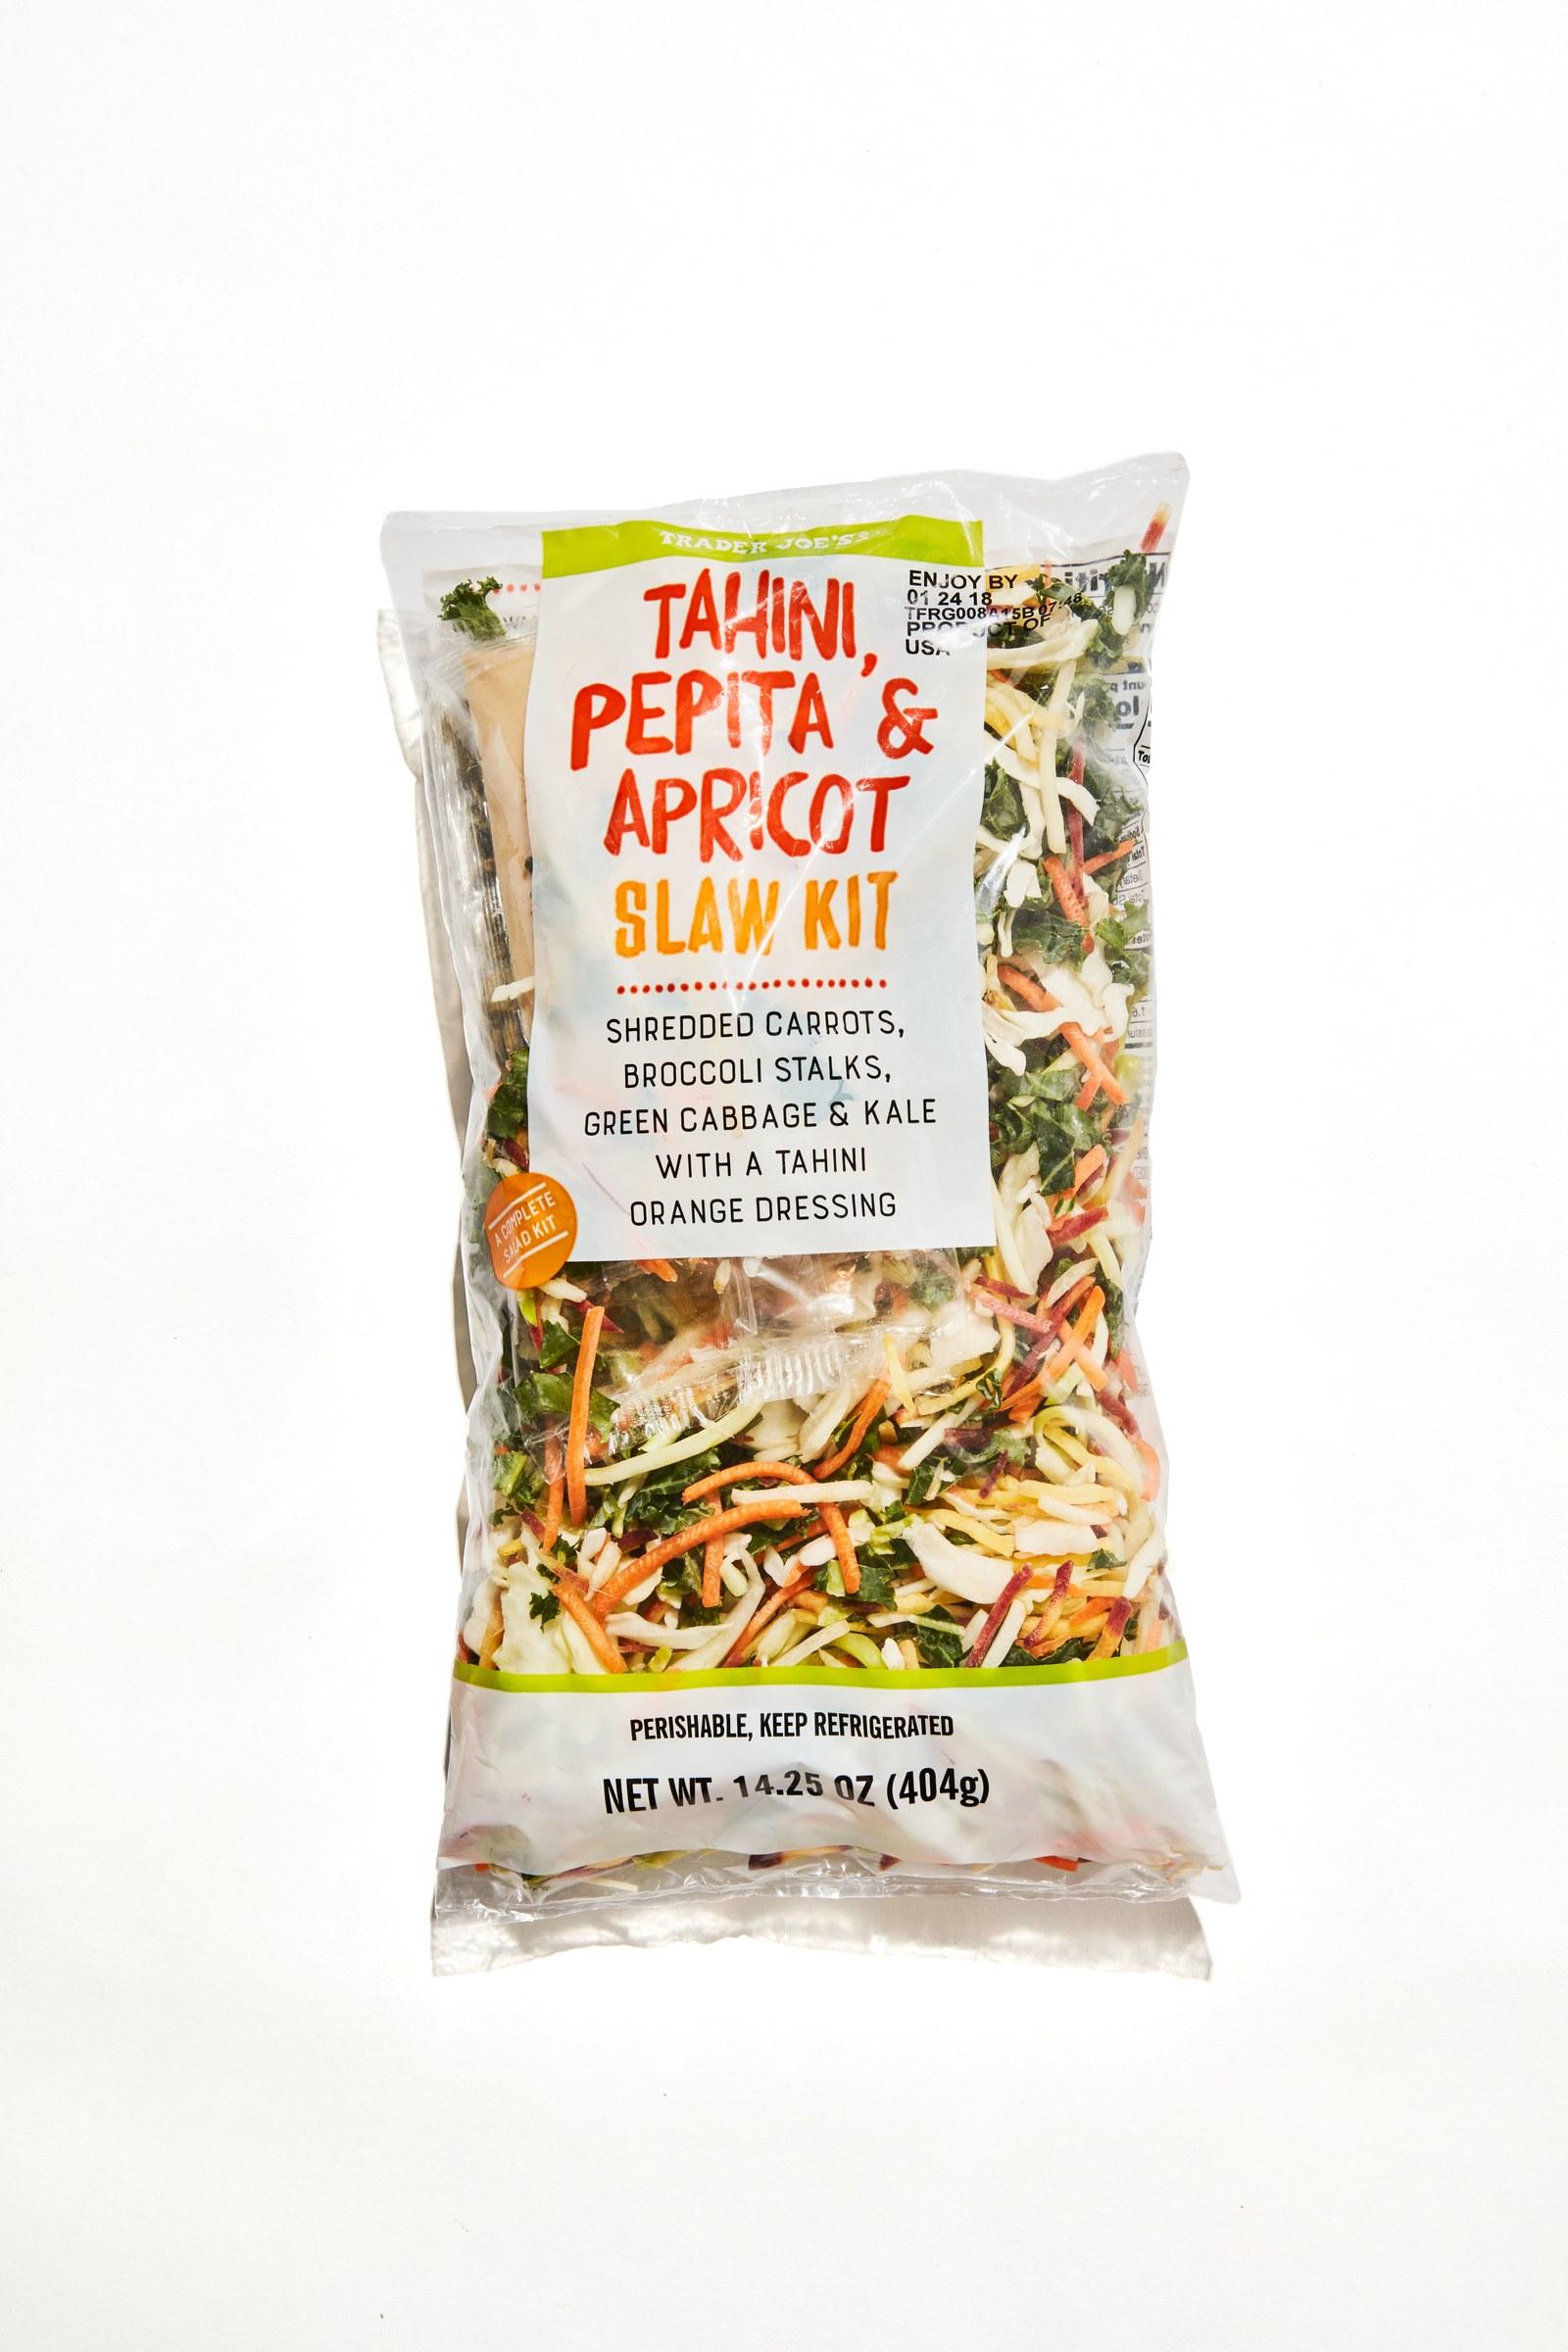 Trader Joe's Tahini, Pepita & Apricot Slaw Kit